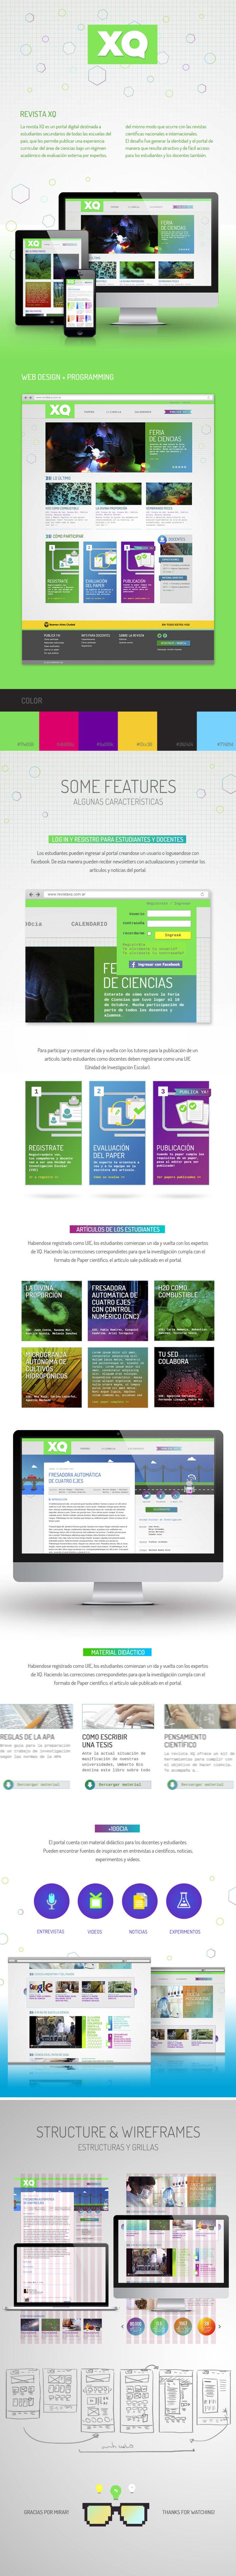 XQ Revista Digital 0